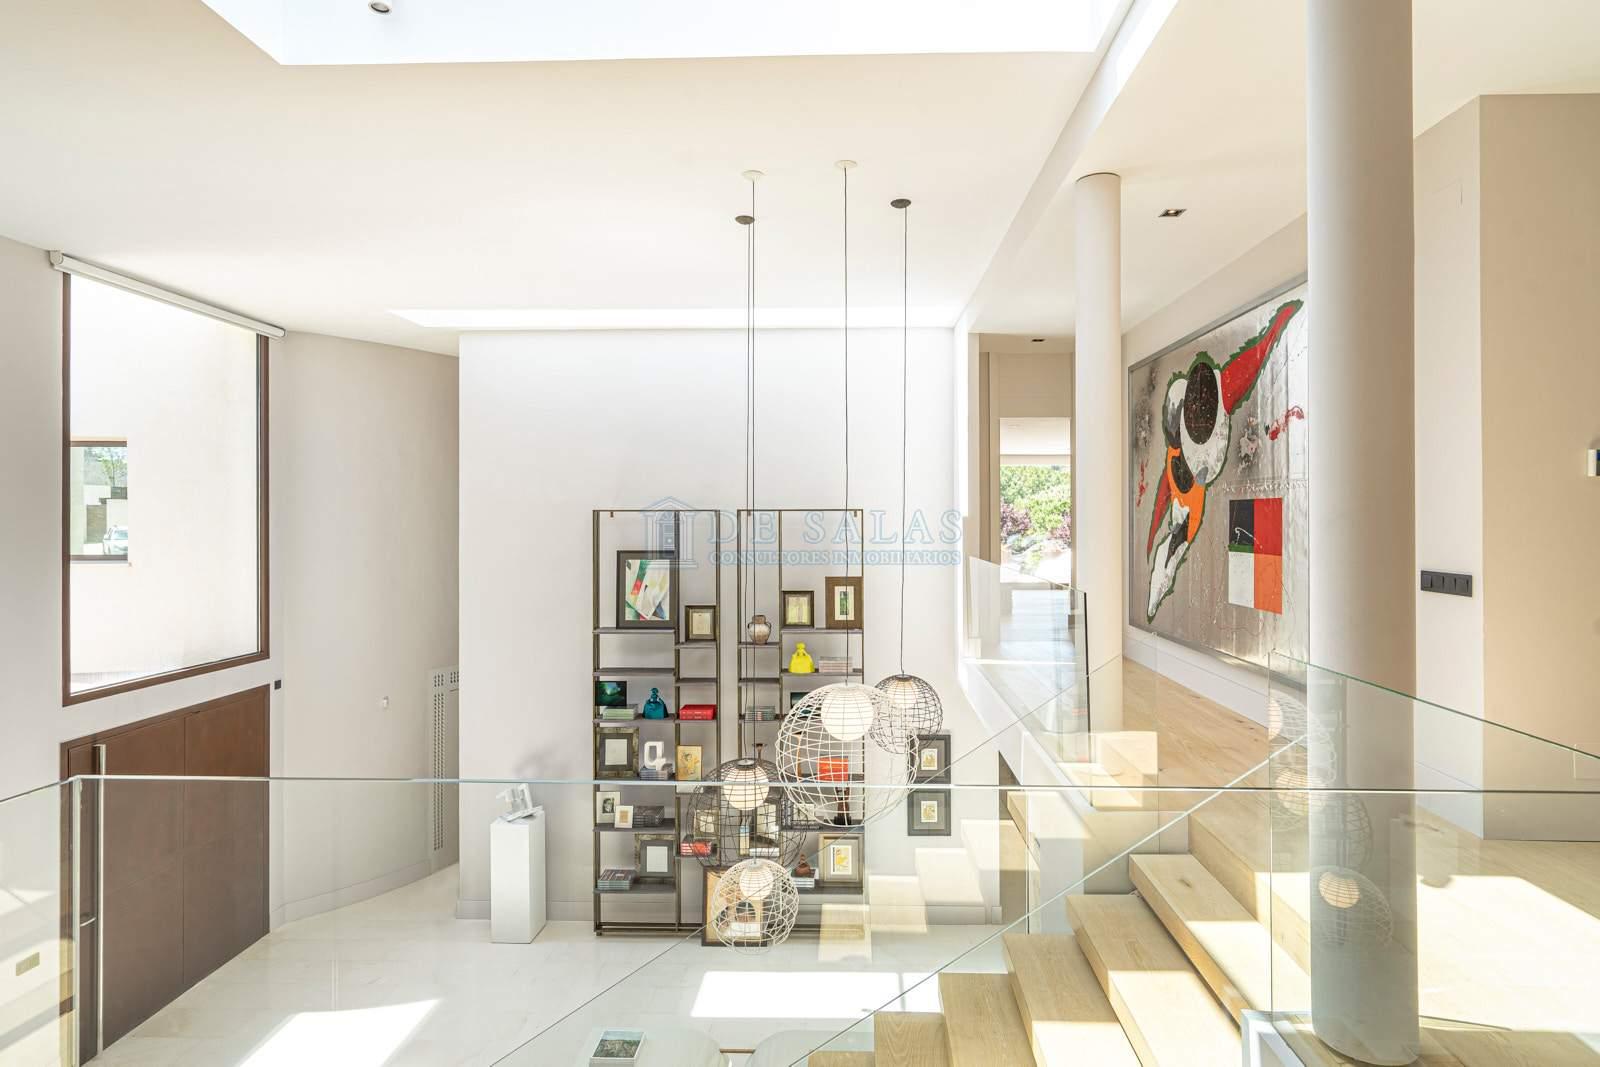 Escalera-0021 House La Moraleja